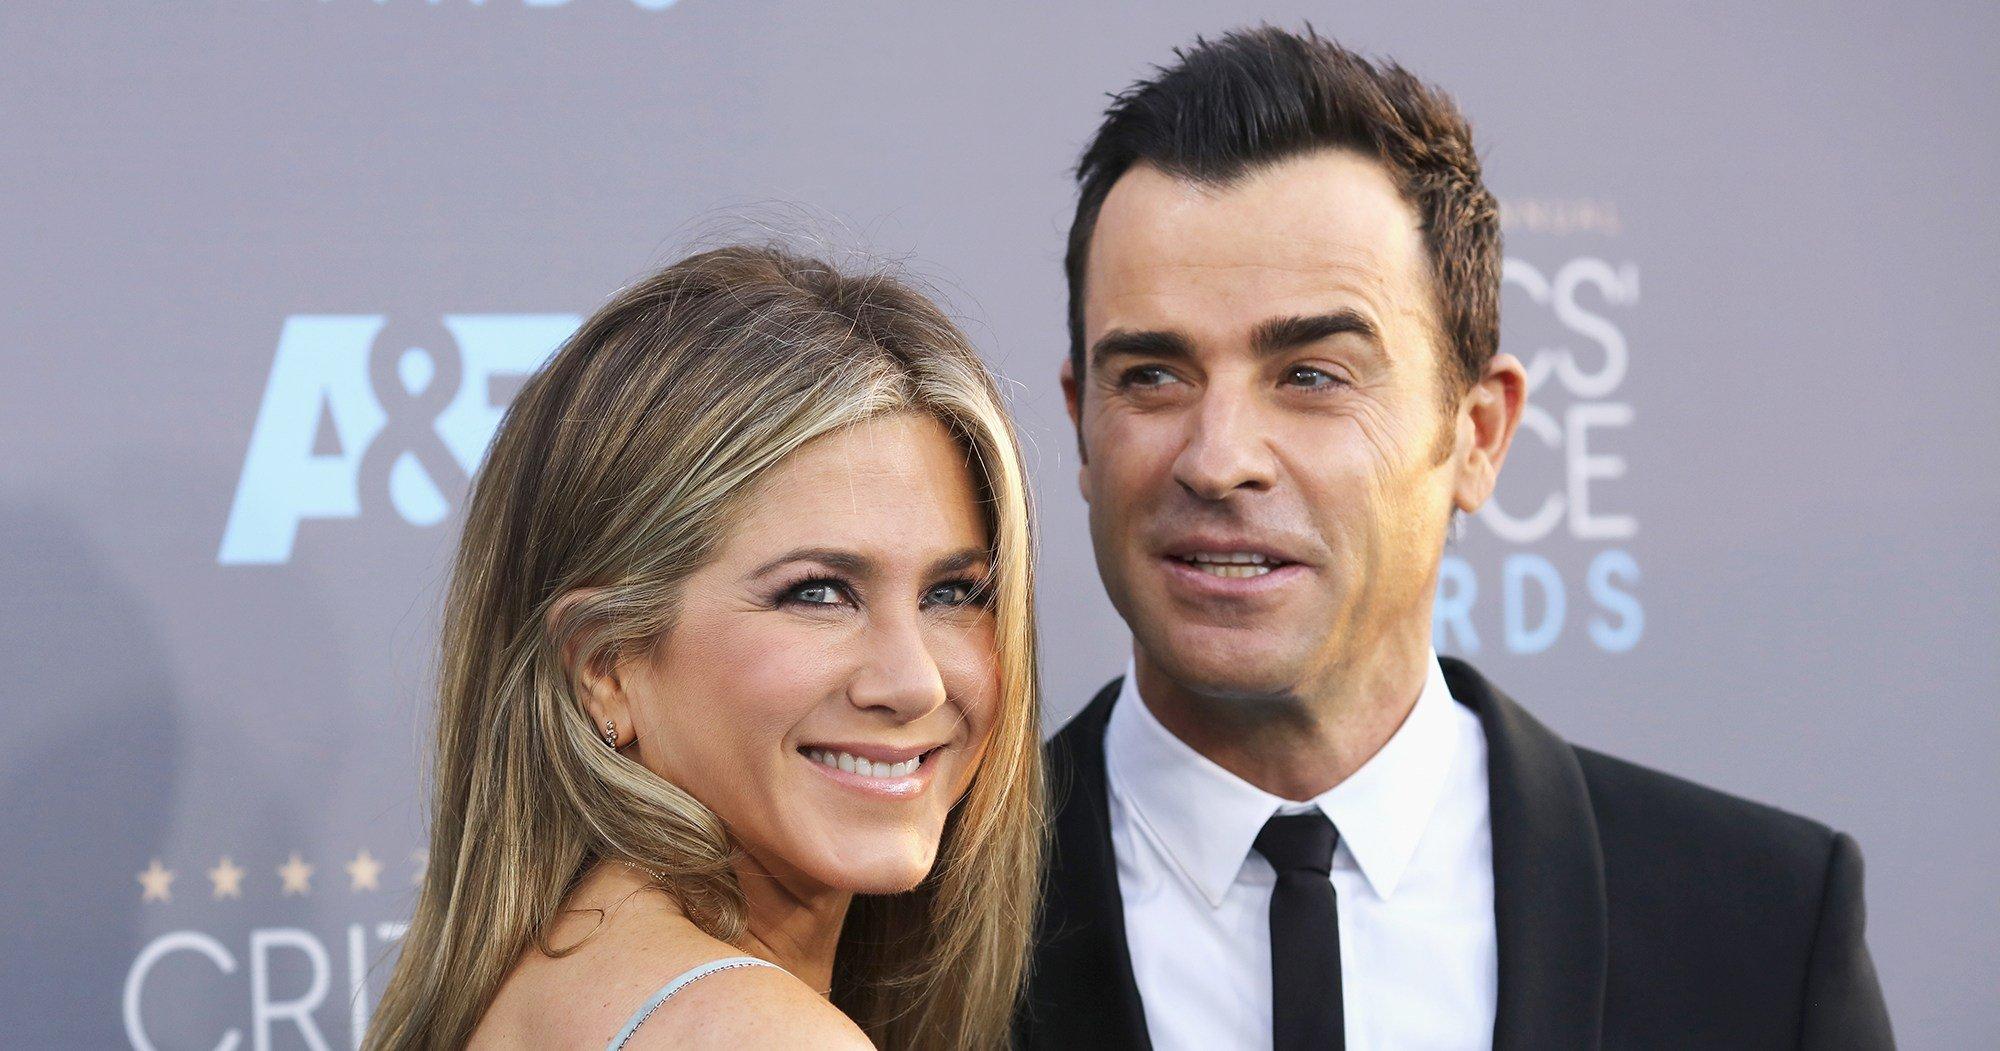 Justin Theroux Wishes 'Fierce' Ex Jennifer Aniston a Happy 50th Birthday